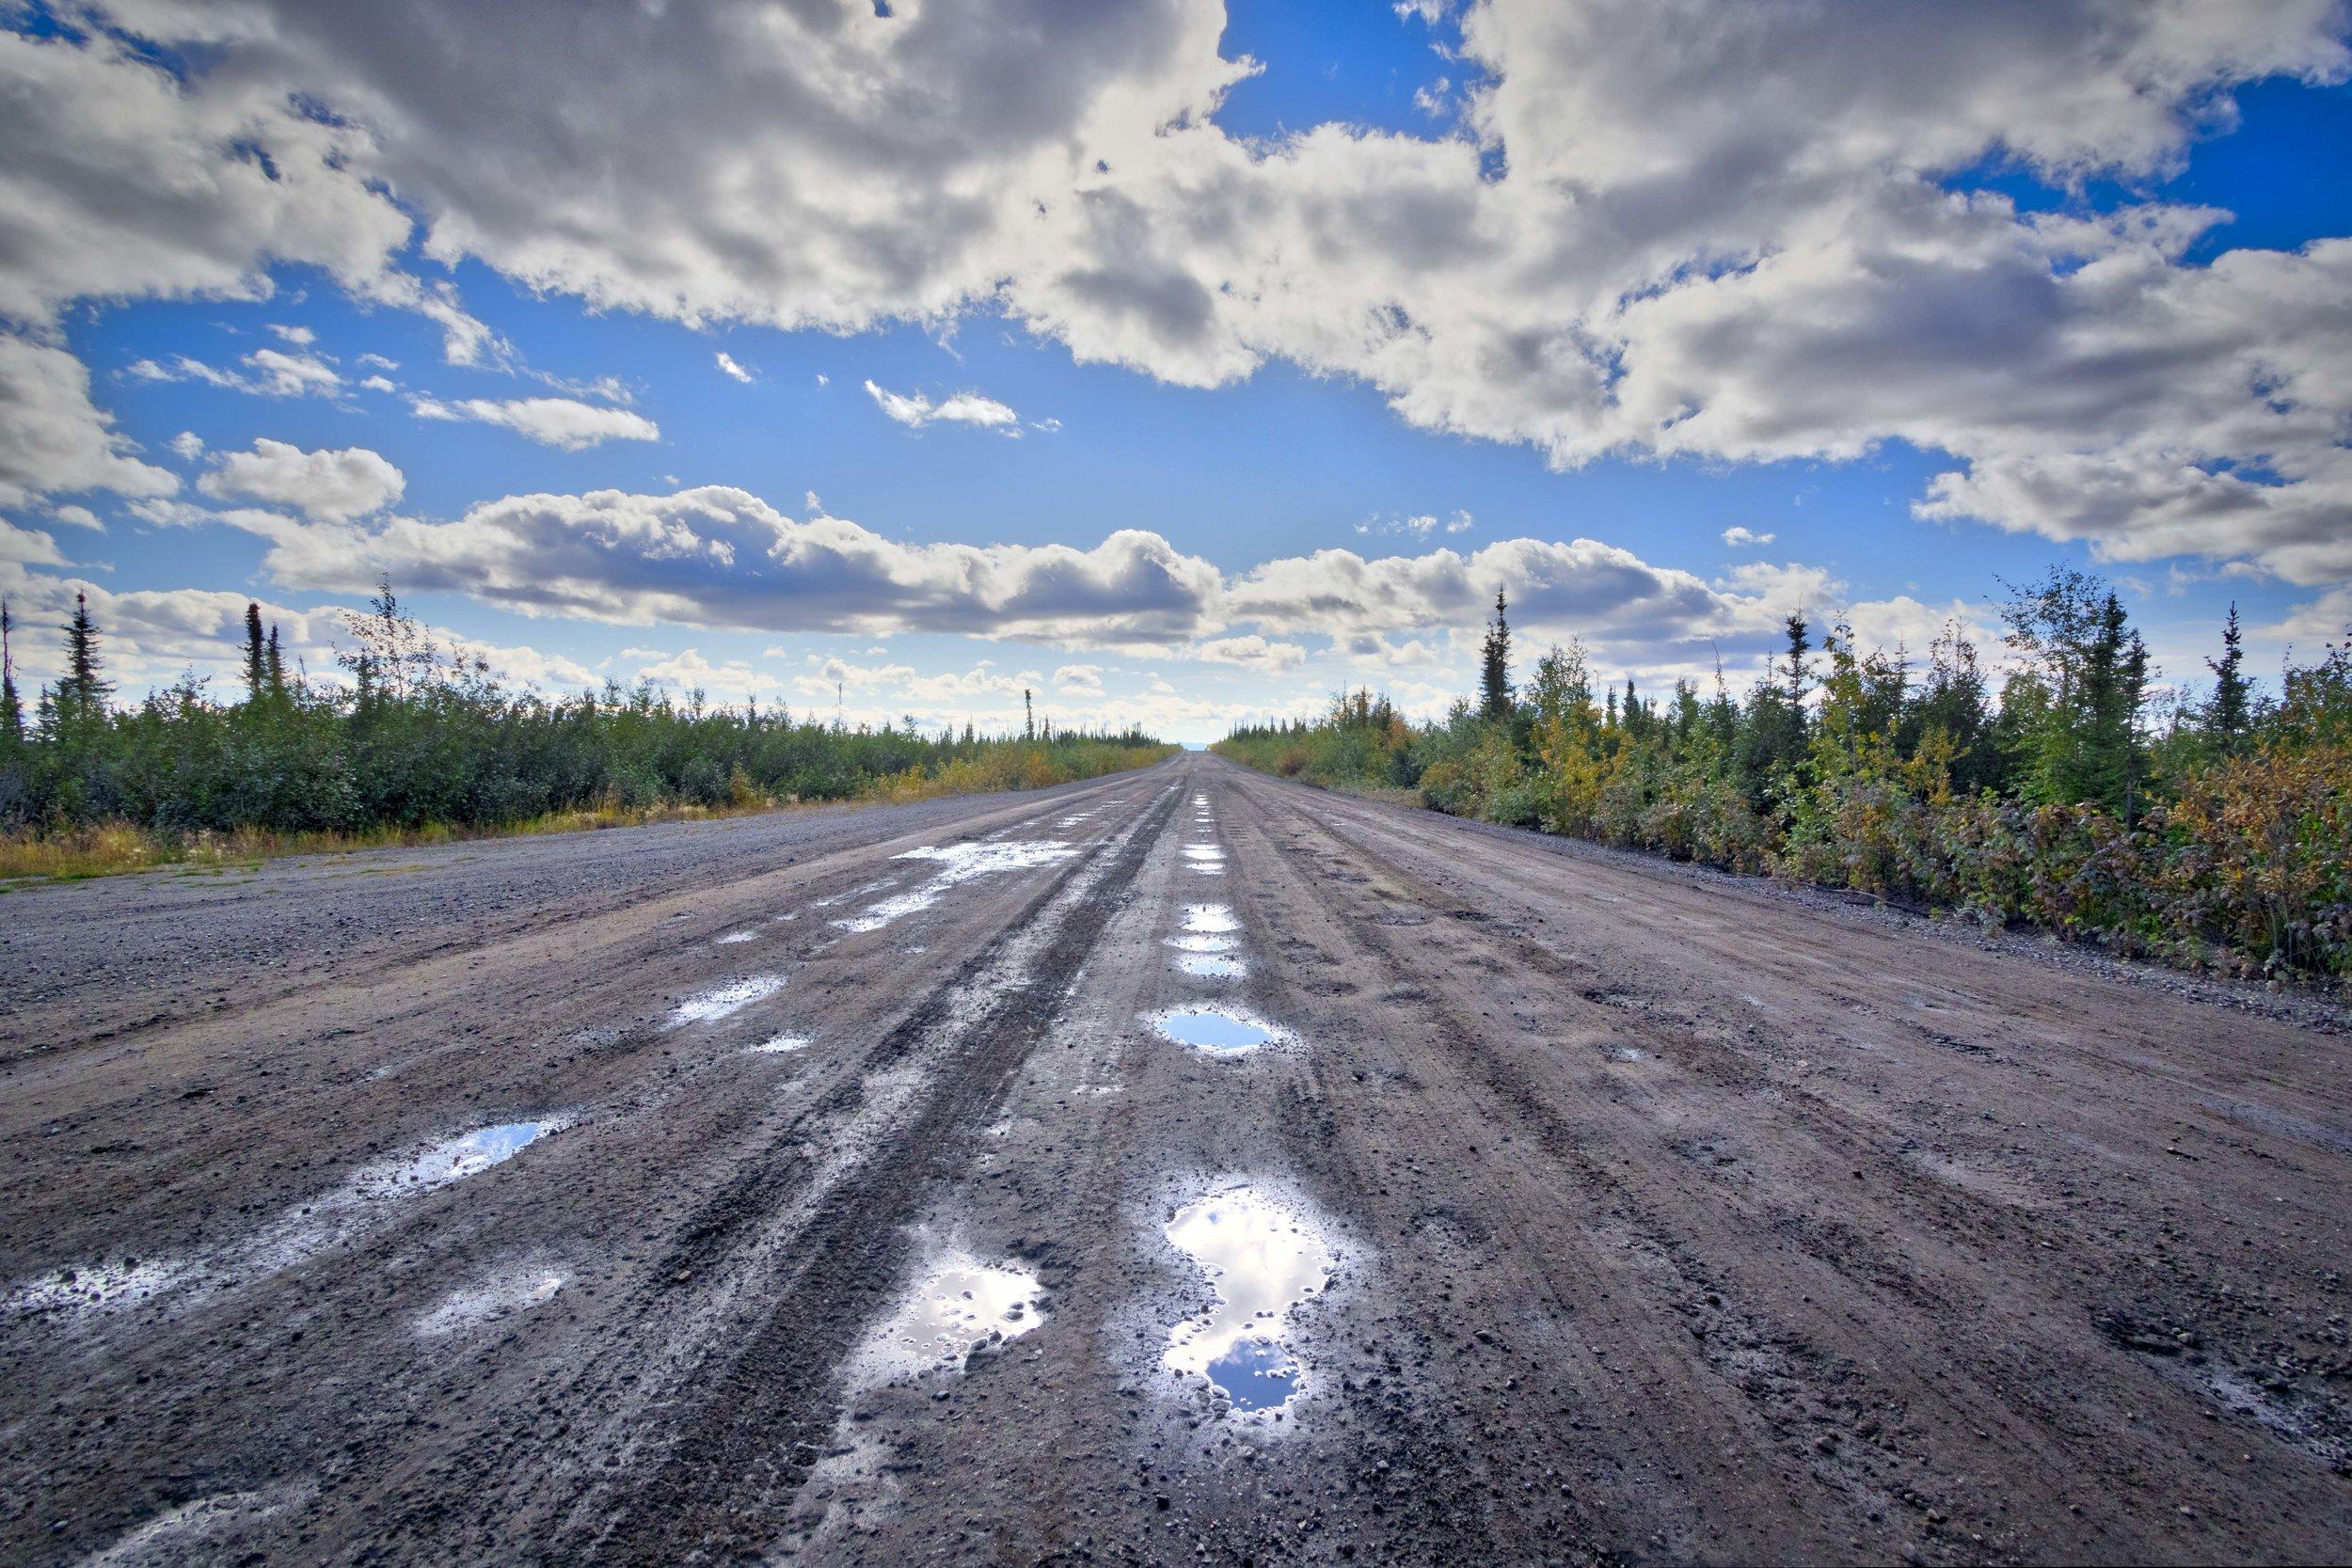 Dempster Highway, Roadtrip, Landscape, Arctic, rob gubiani, Tundra, Tombstone, Tuktoyuktuk, Inuvik, Dempster, Yukon, travel, wanderlust, boreal, forest, boreal forest, gravel, road, track, potholes,